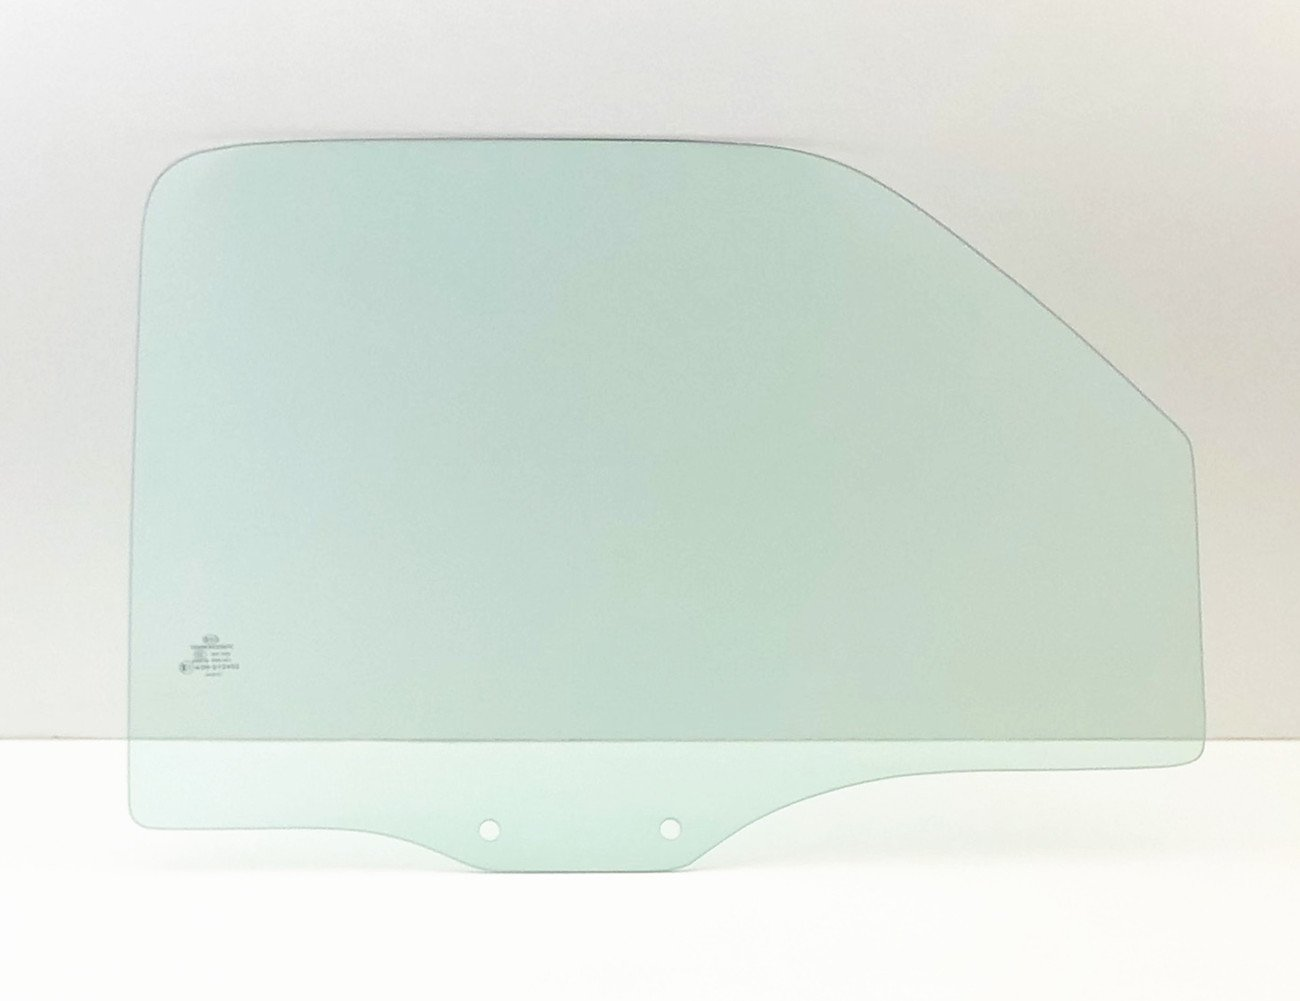 NAGD Fits 1993-2012 Ford Ranger /& 1994-2010 Mazda B3000 B4000 B2500 B2300 2 Door Pickup Passenger Side Right Front Door Window Glass